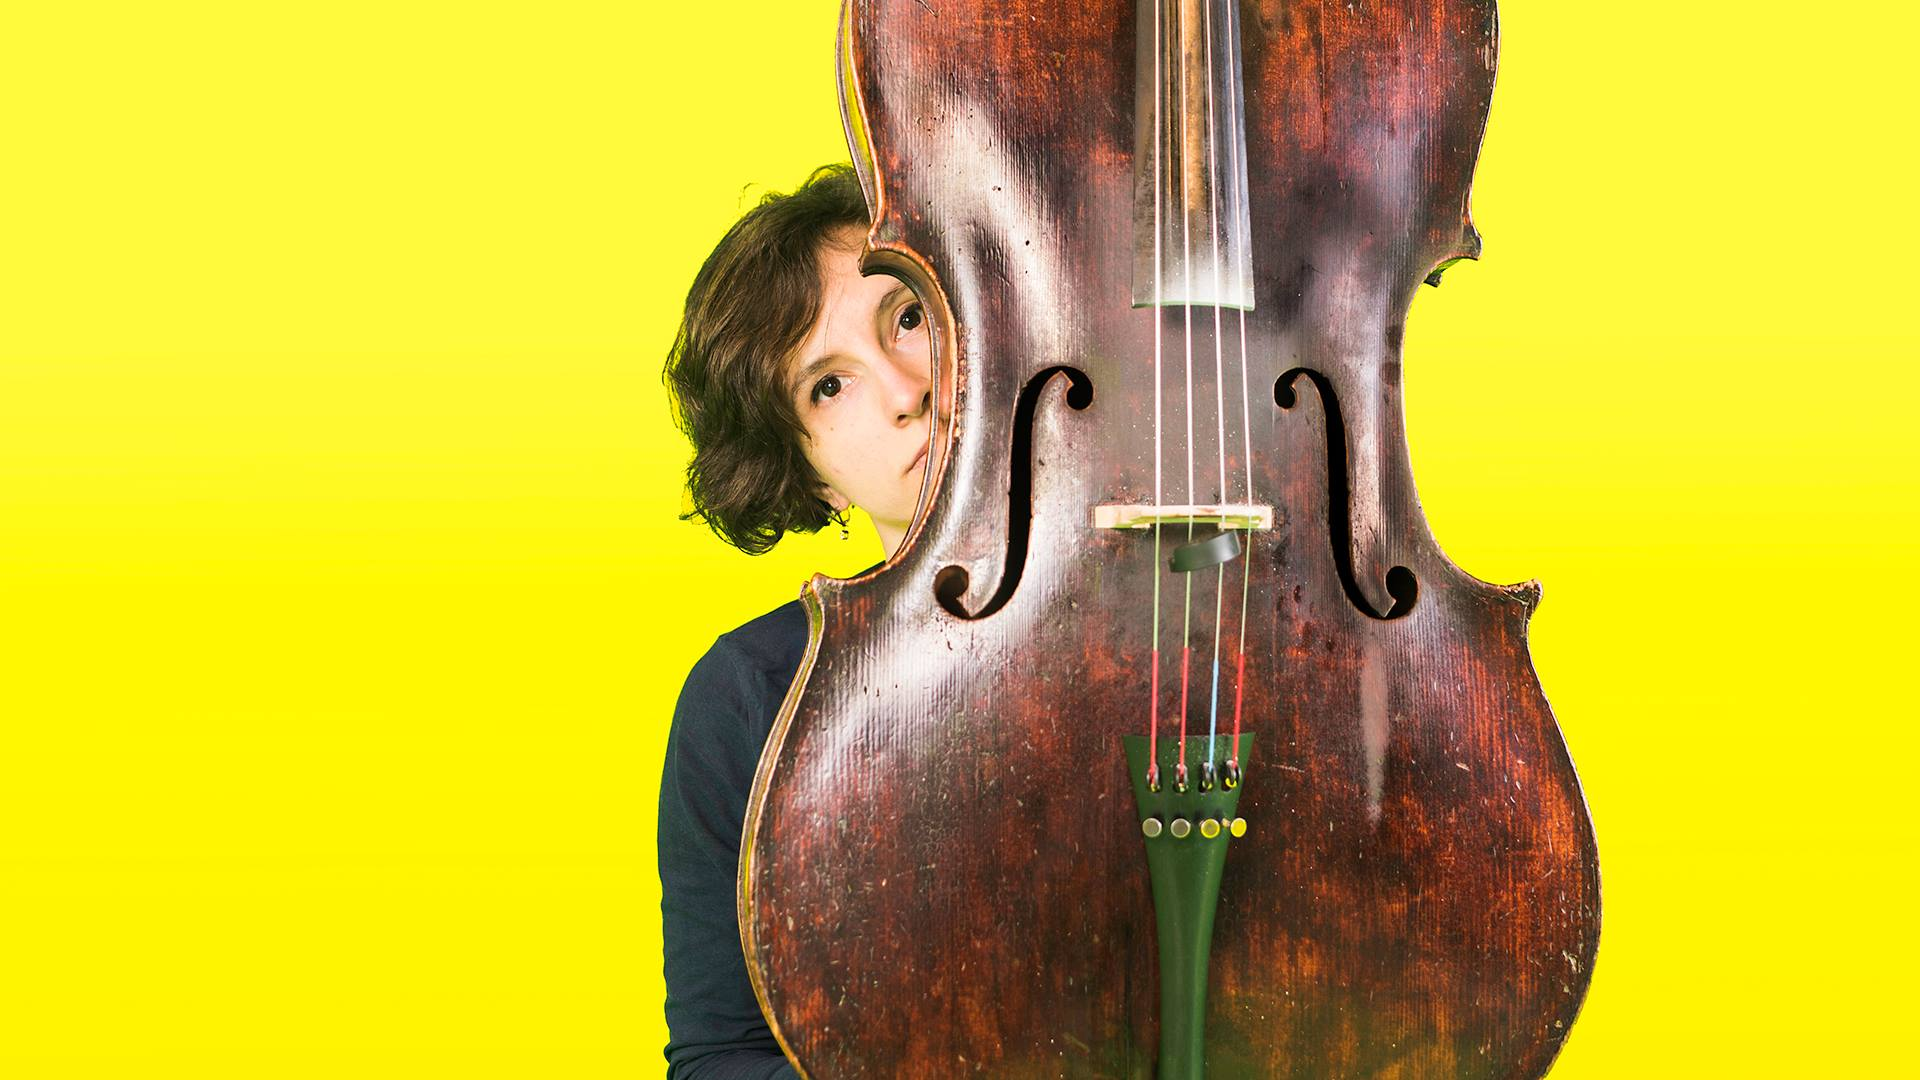 Lân fan taal, Explore the North en Noord Nederlands Orkest presenteren 'Solo'